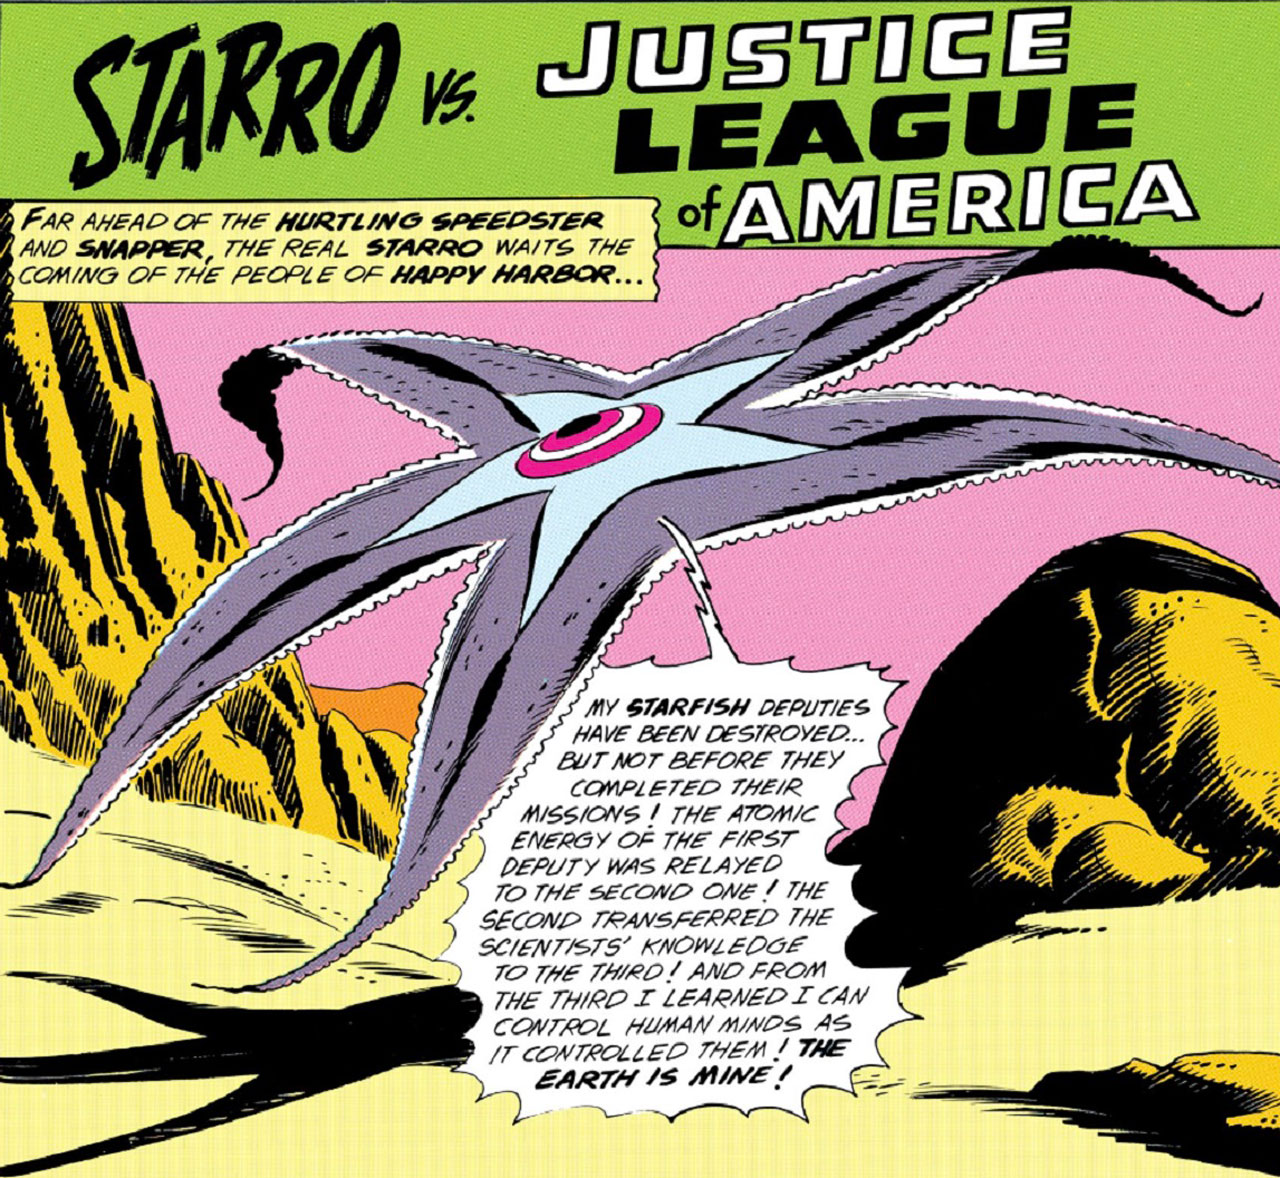 Justice-League-Starro.jpg